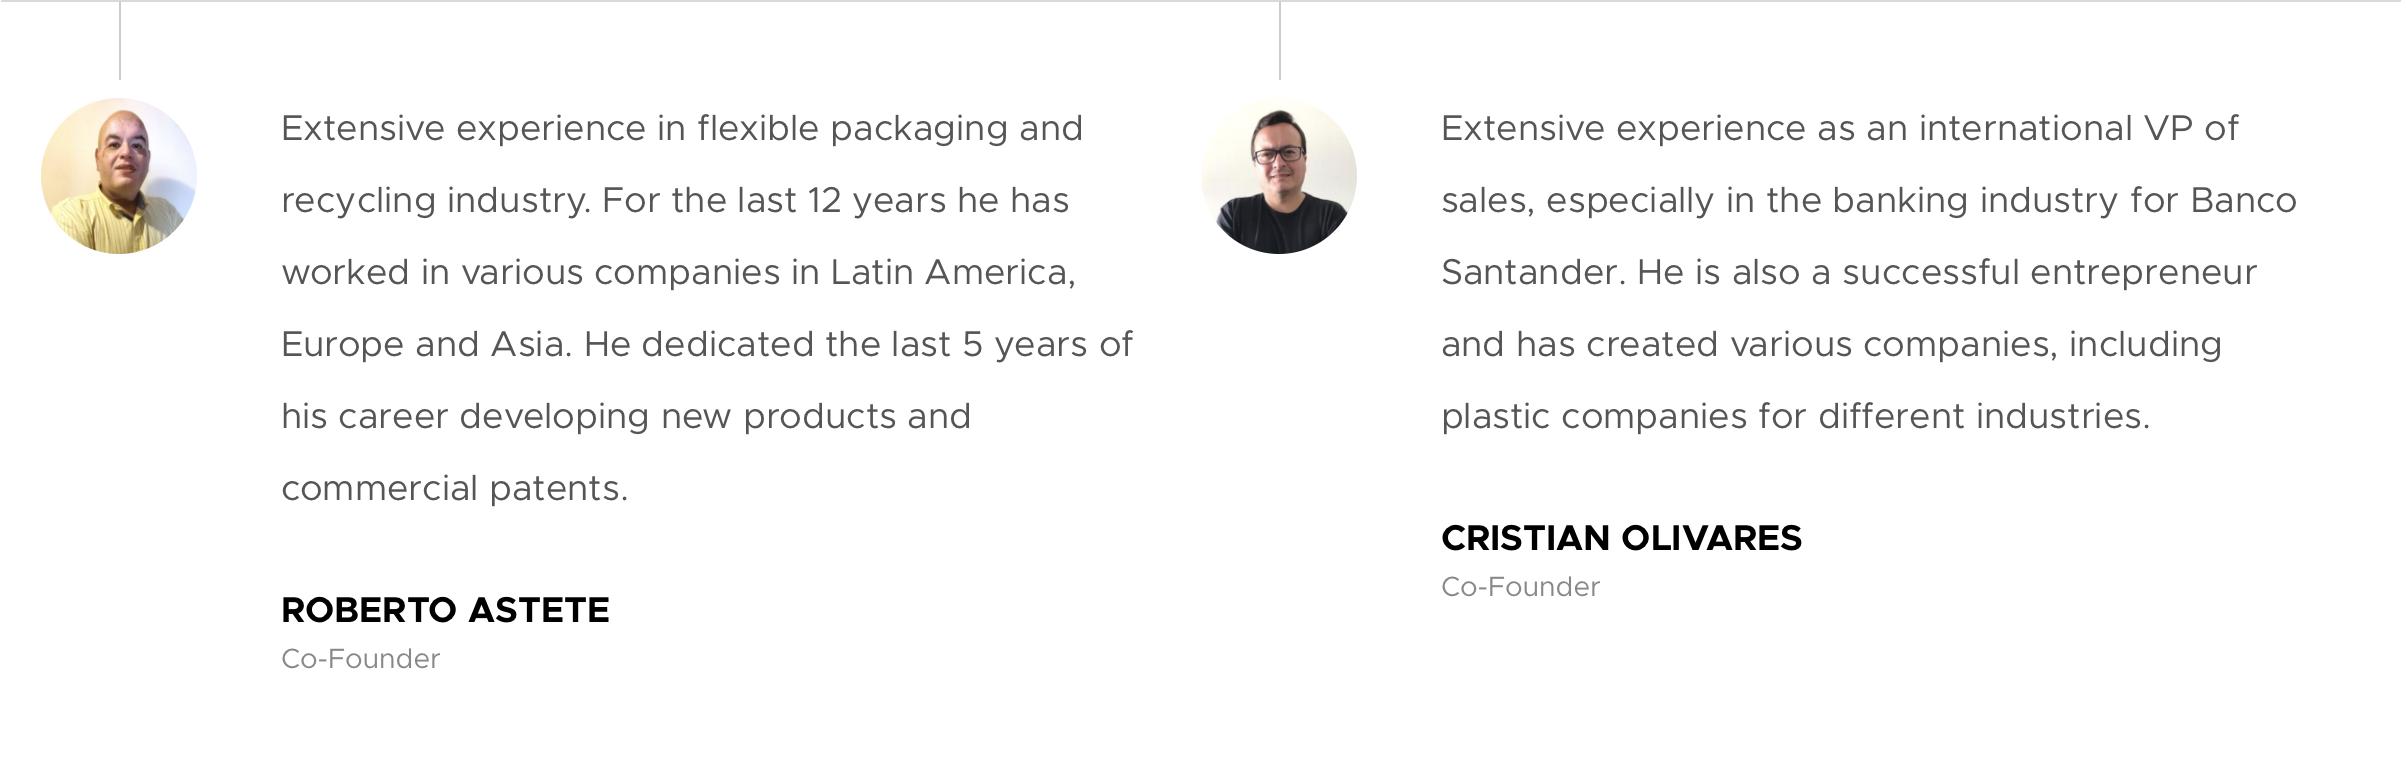 Roberto Astete & Cristian Olivares